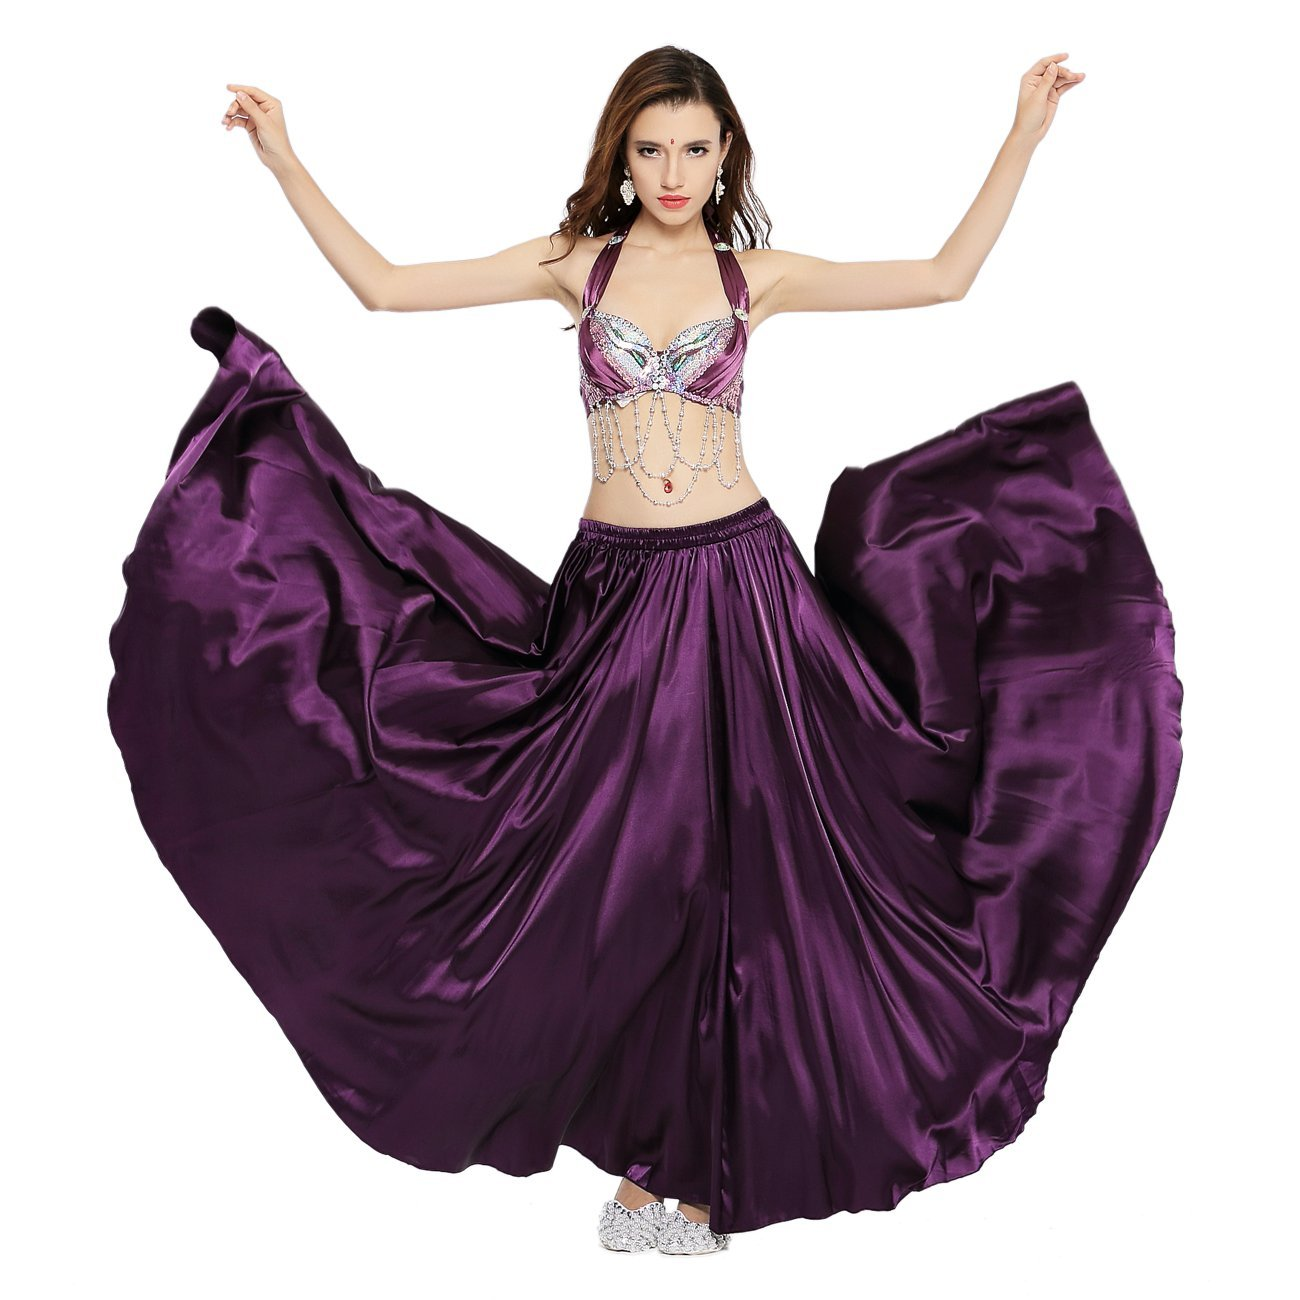 240159e18cc4 Amazon.com: Dance Fairy Belly Dance Satin Long Skirt,Purple: Clothing